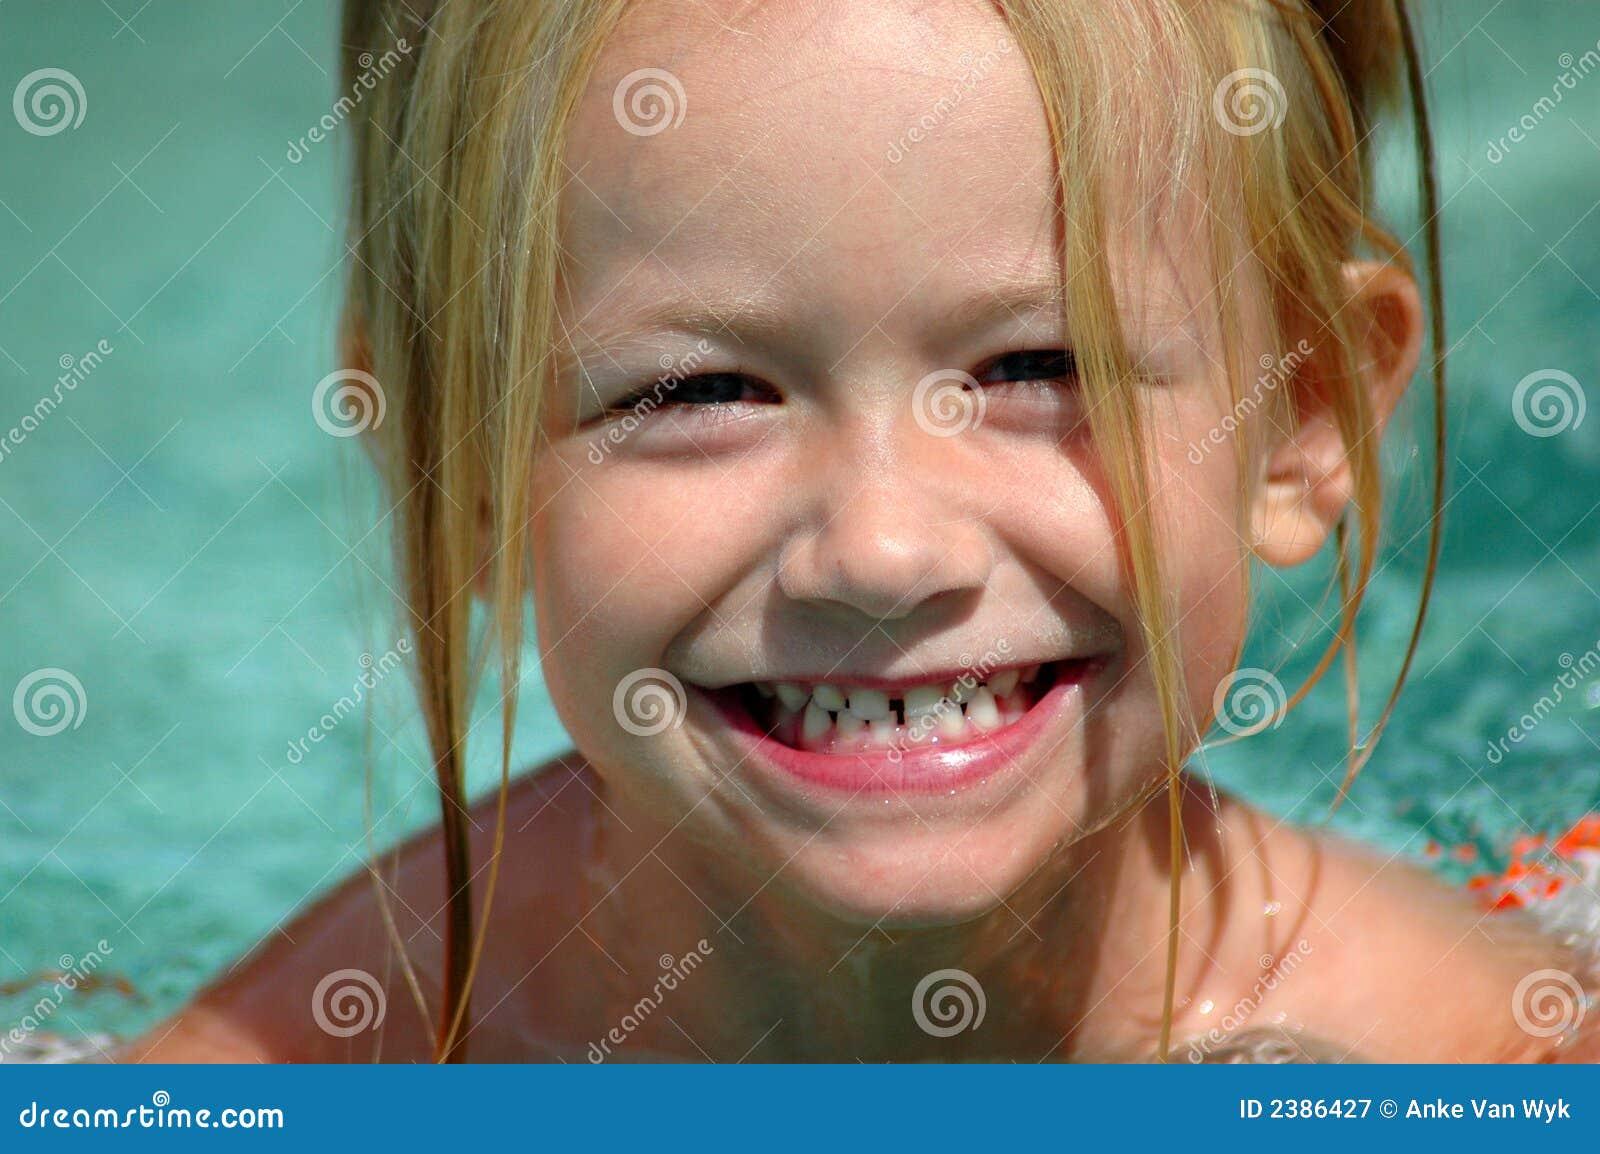 Giggling child